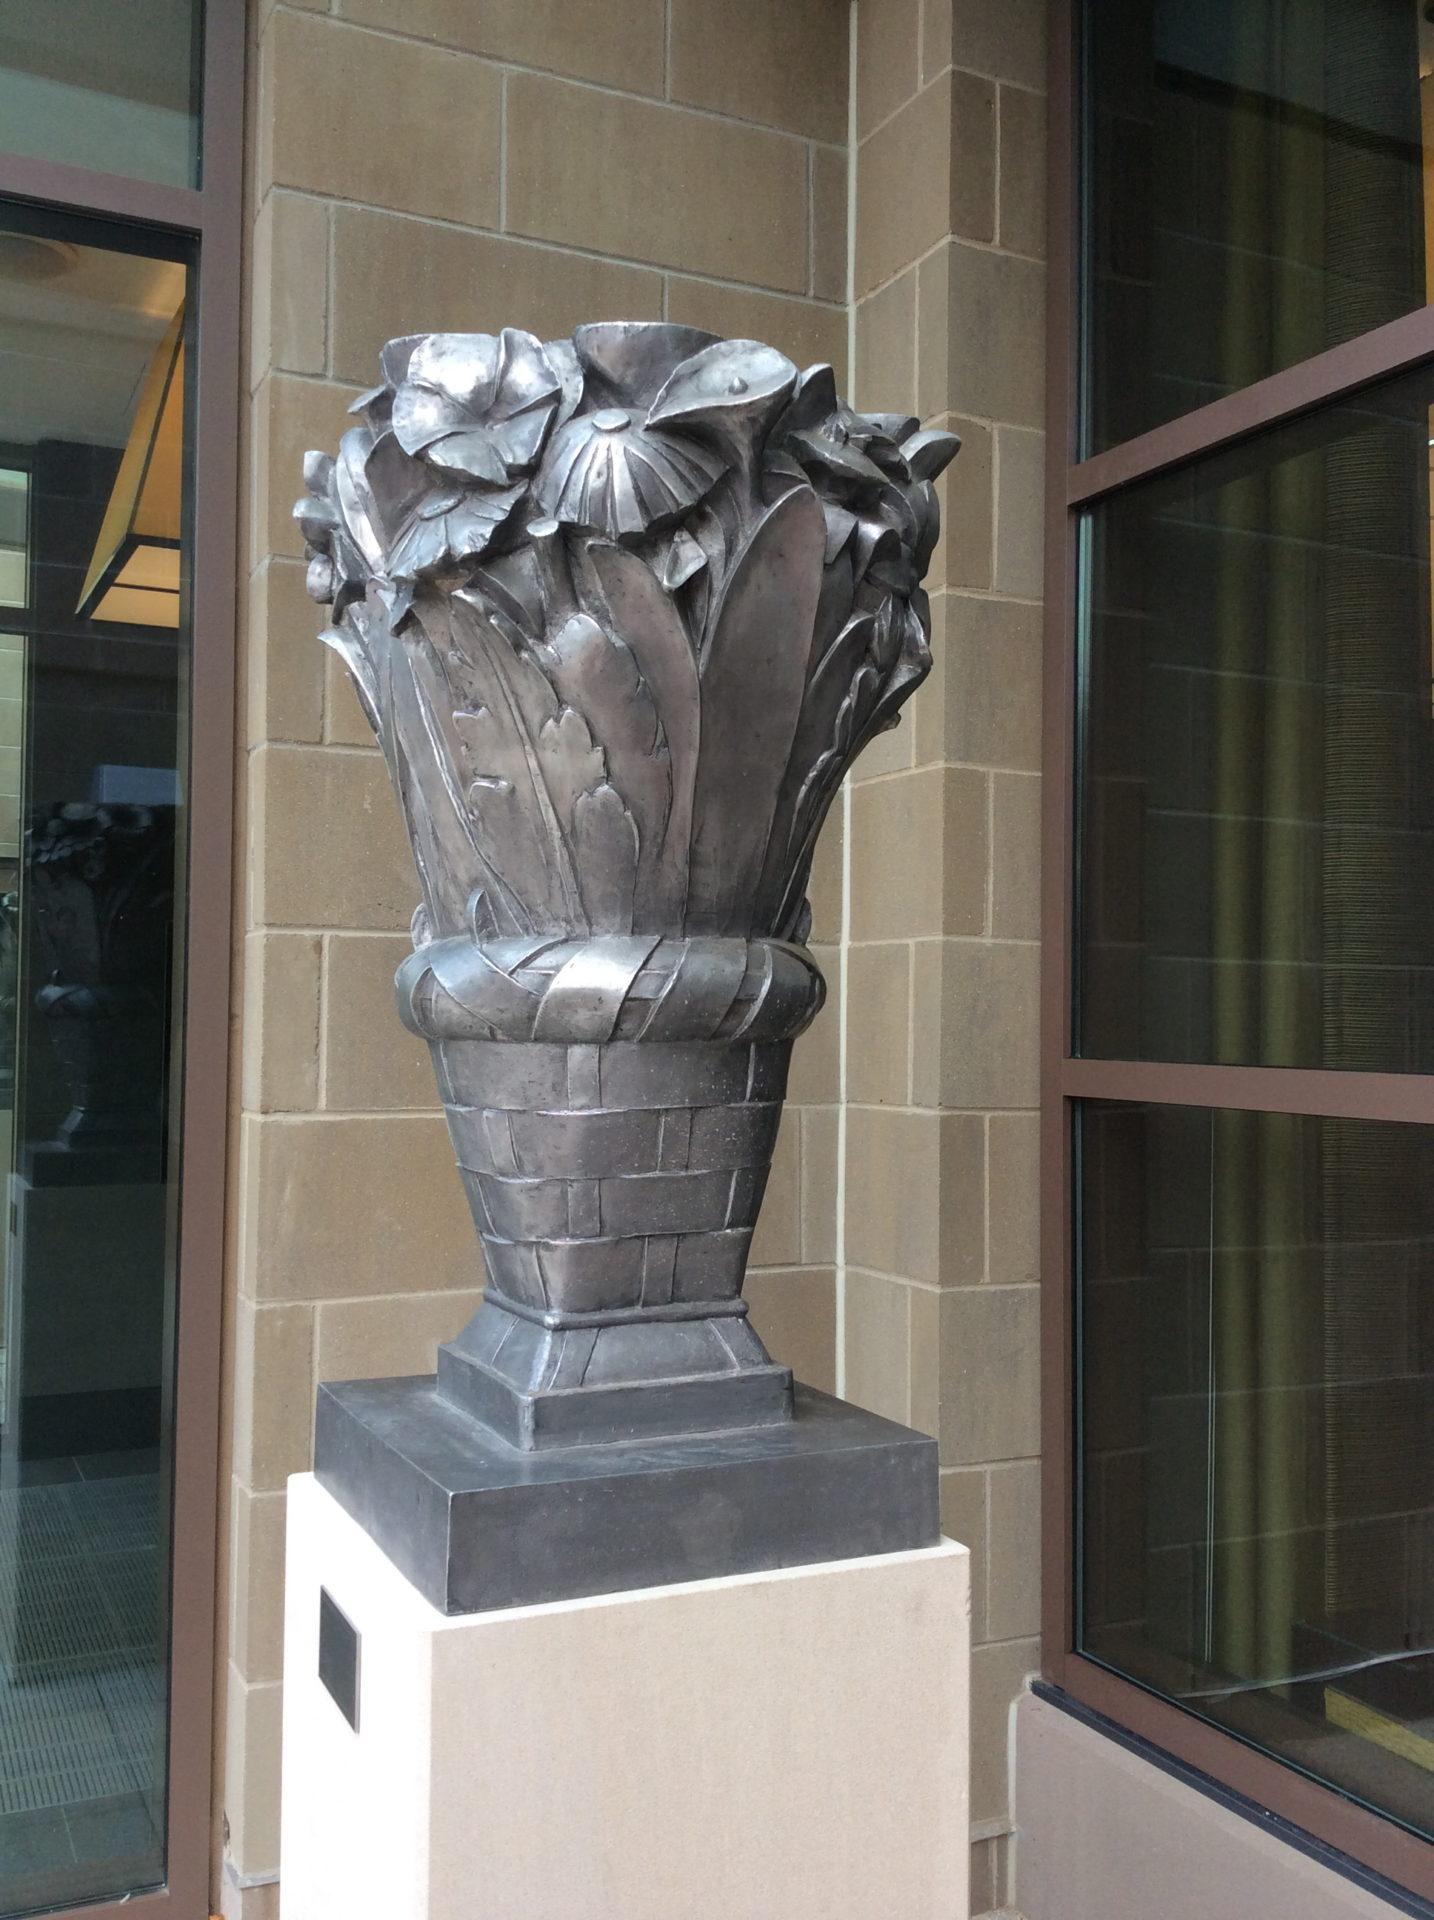 Basket of Flowers — Stephen Robin